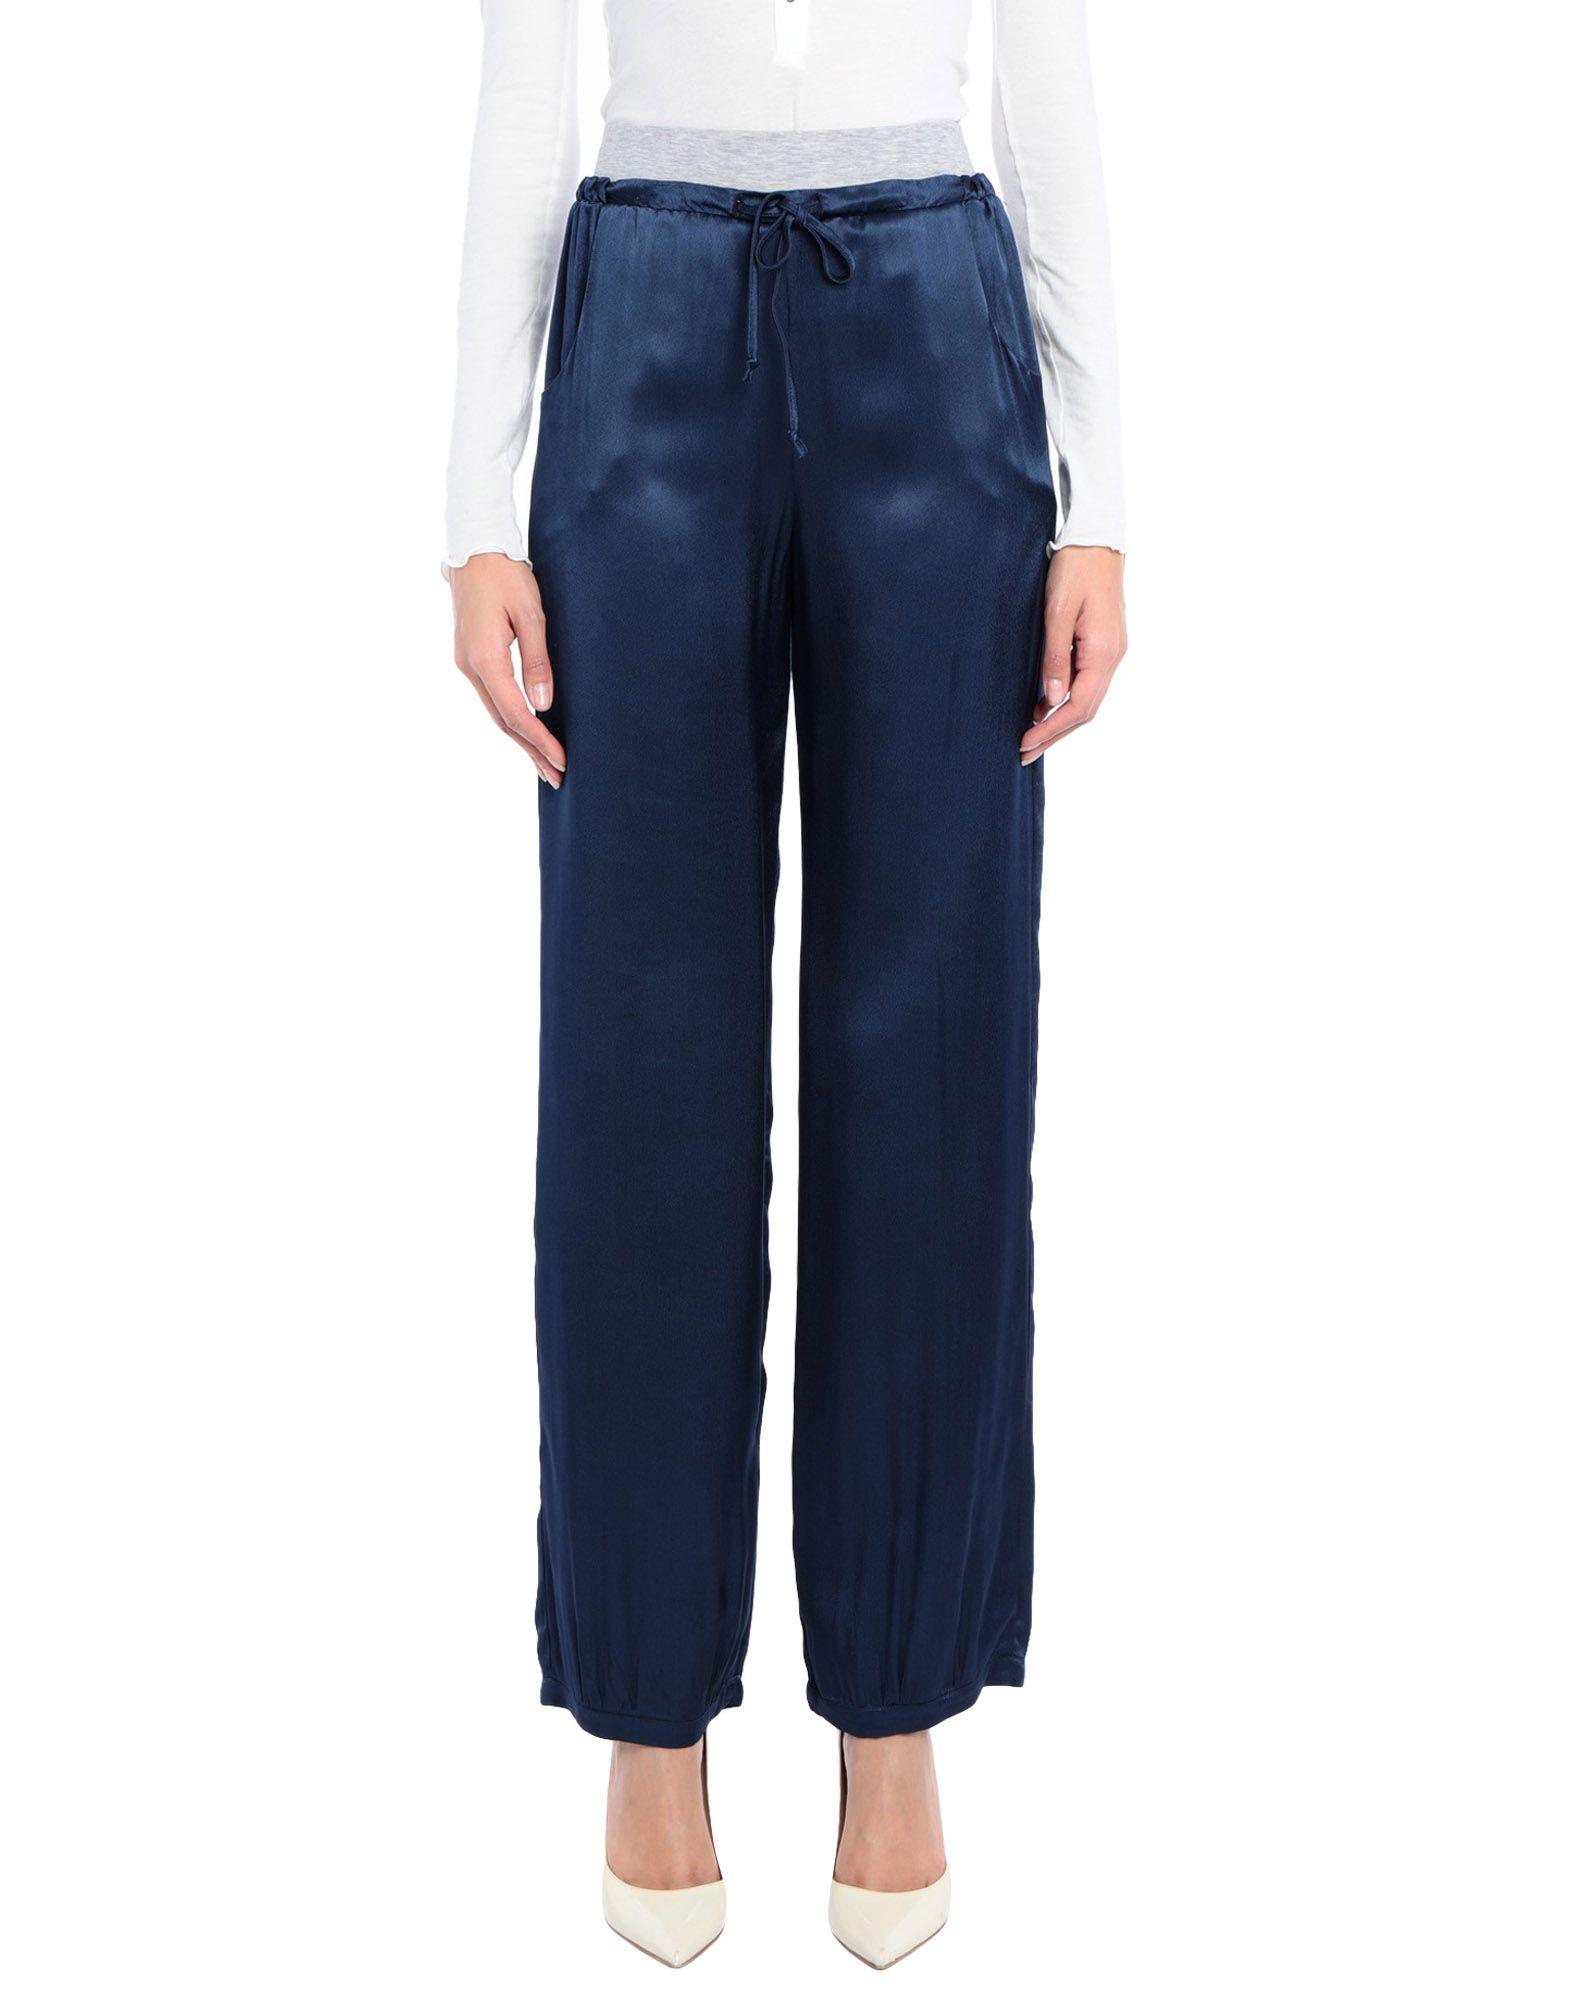 Pantalone Pianurastudio donna - - 13278640UM  Verkauf